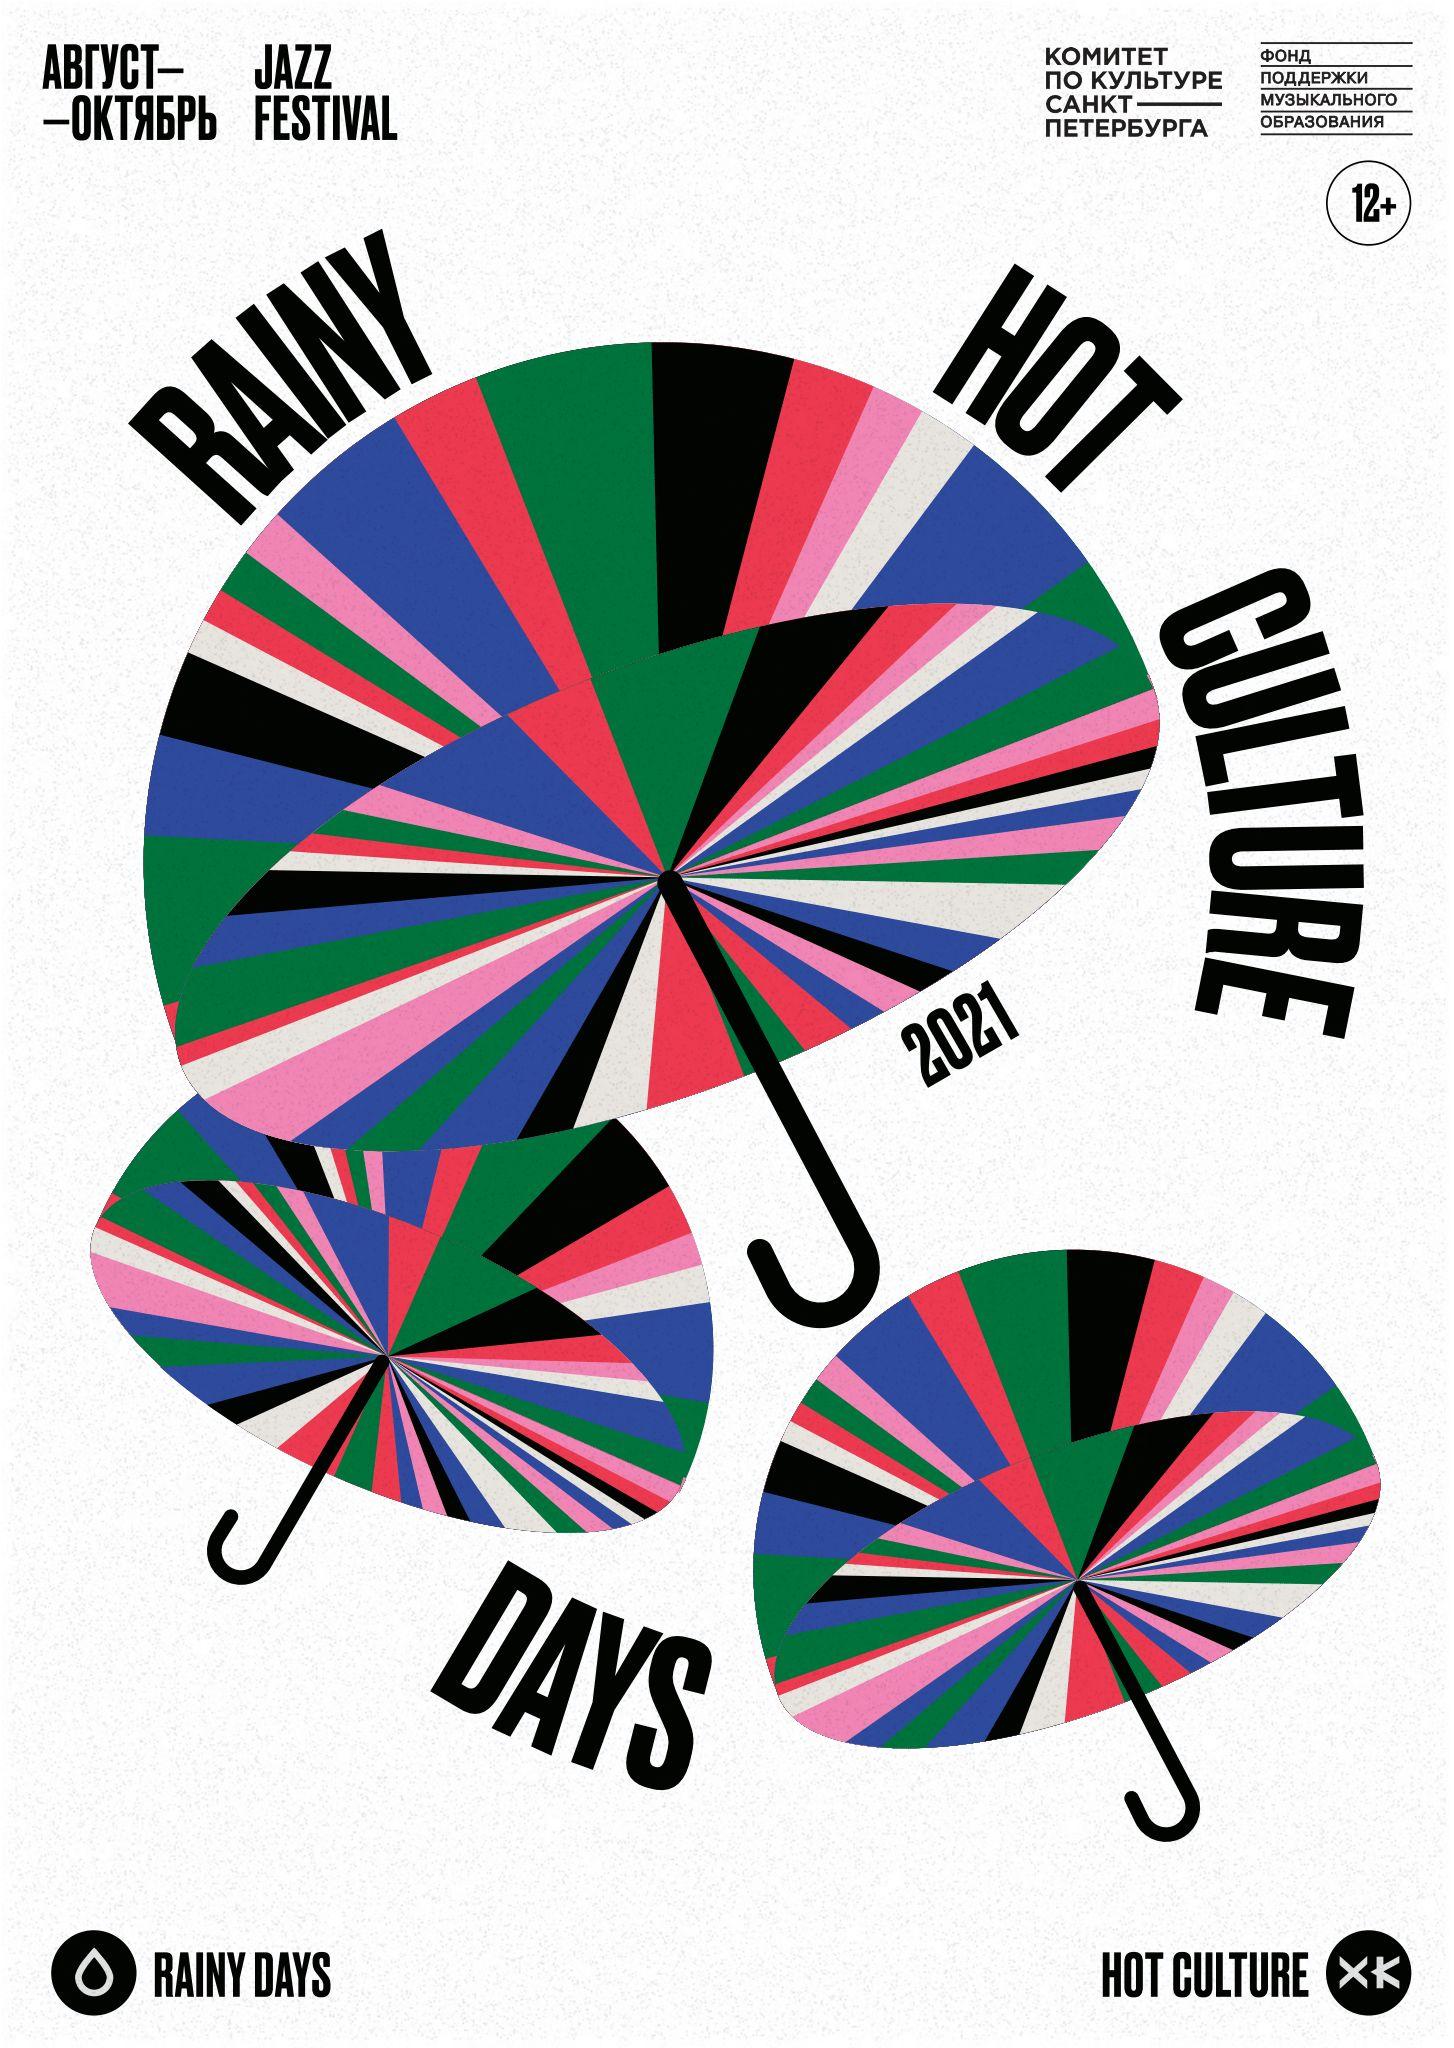 JAZZ NEWS: Rainy Hot Culture Days Festival Runs August 19 through September 4, 2021